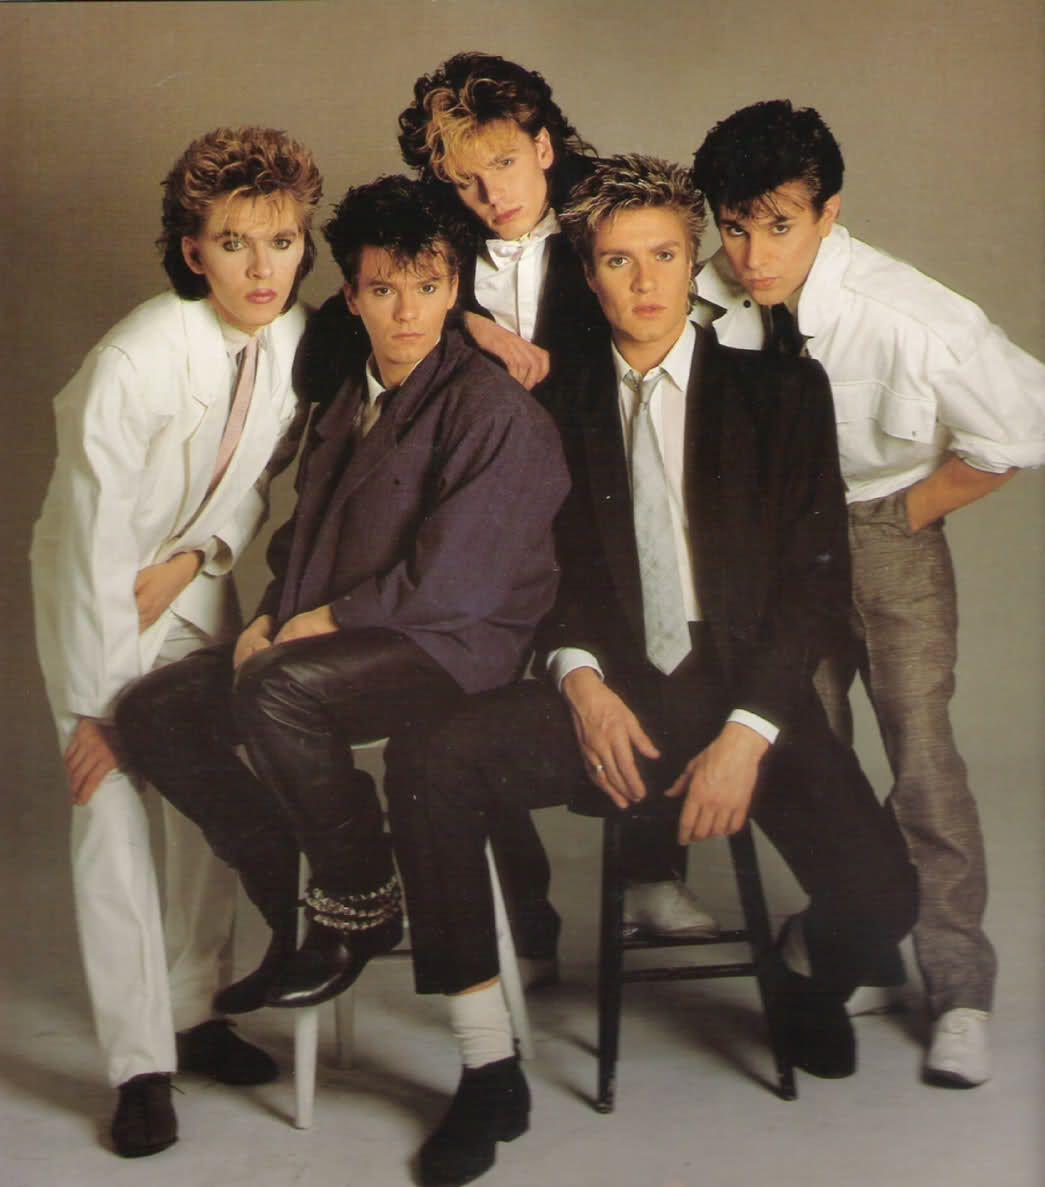 3 Duran Duran Musica De Los 70 Cantantes Bandas De Rock